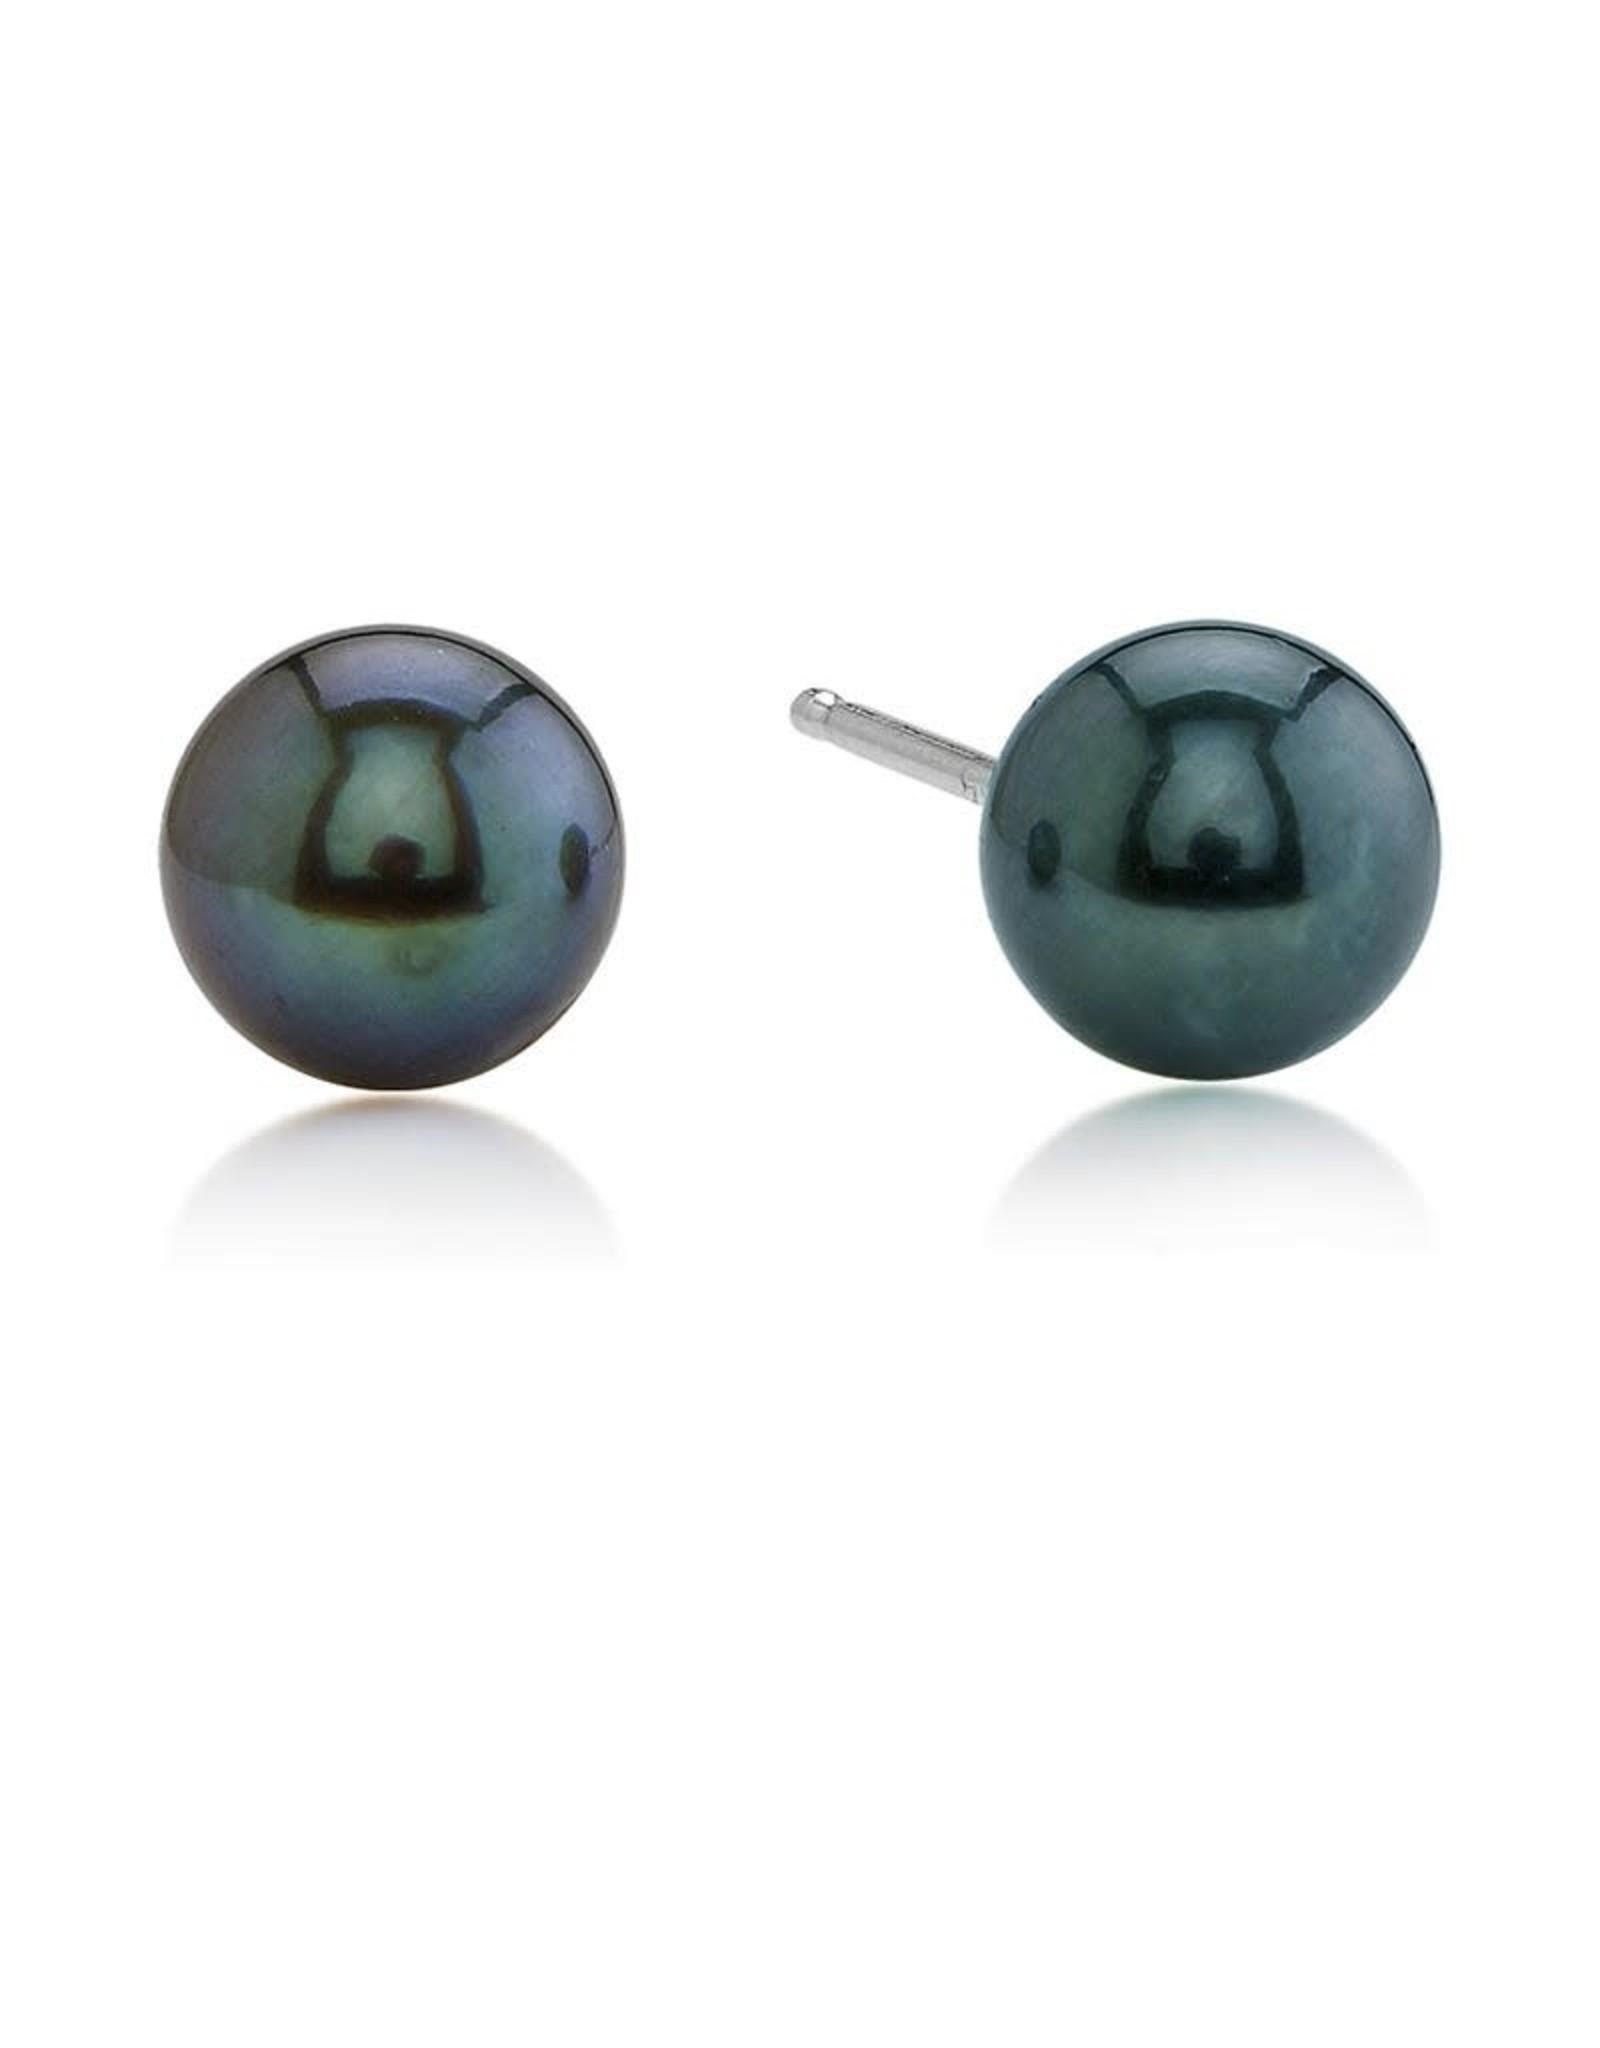 14K White Gold 6mm Black Pearl Stud Earrings